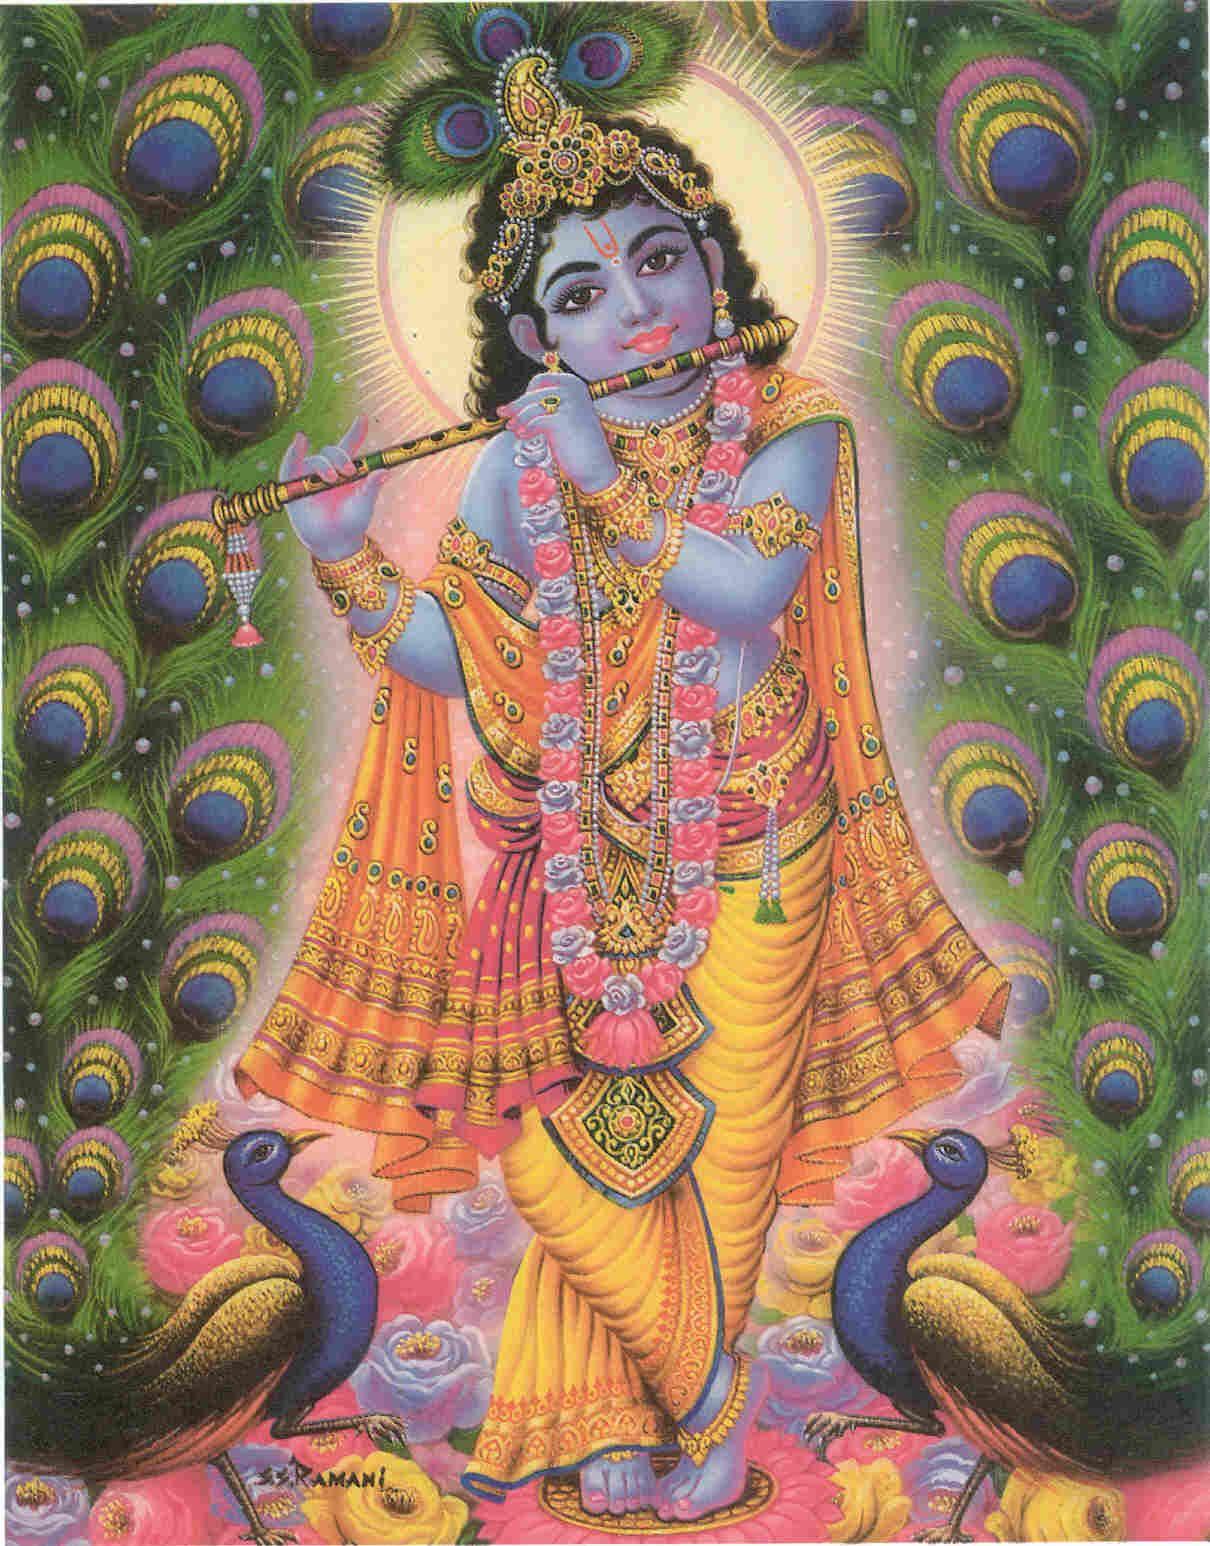 Sri Krishna framed by peacocks